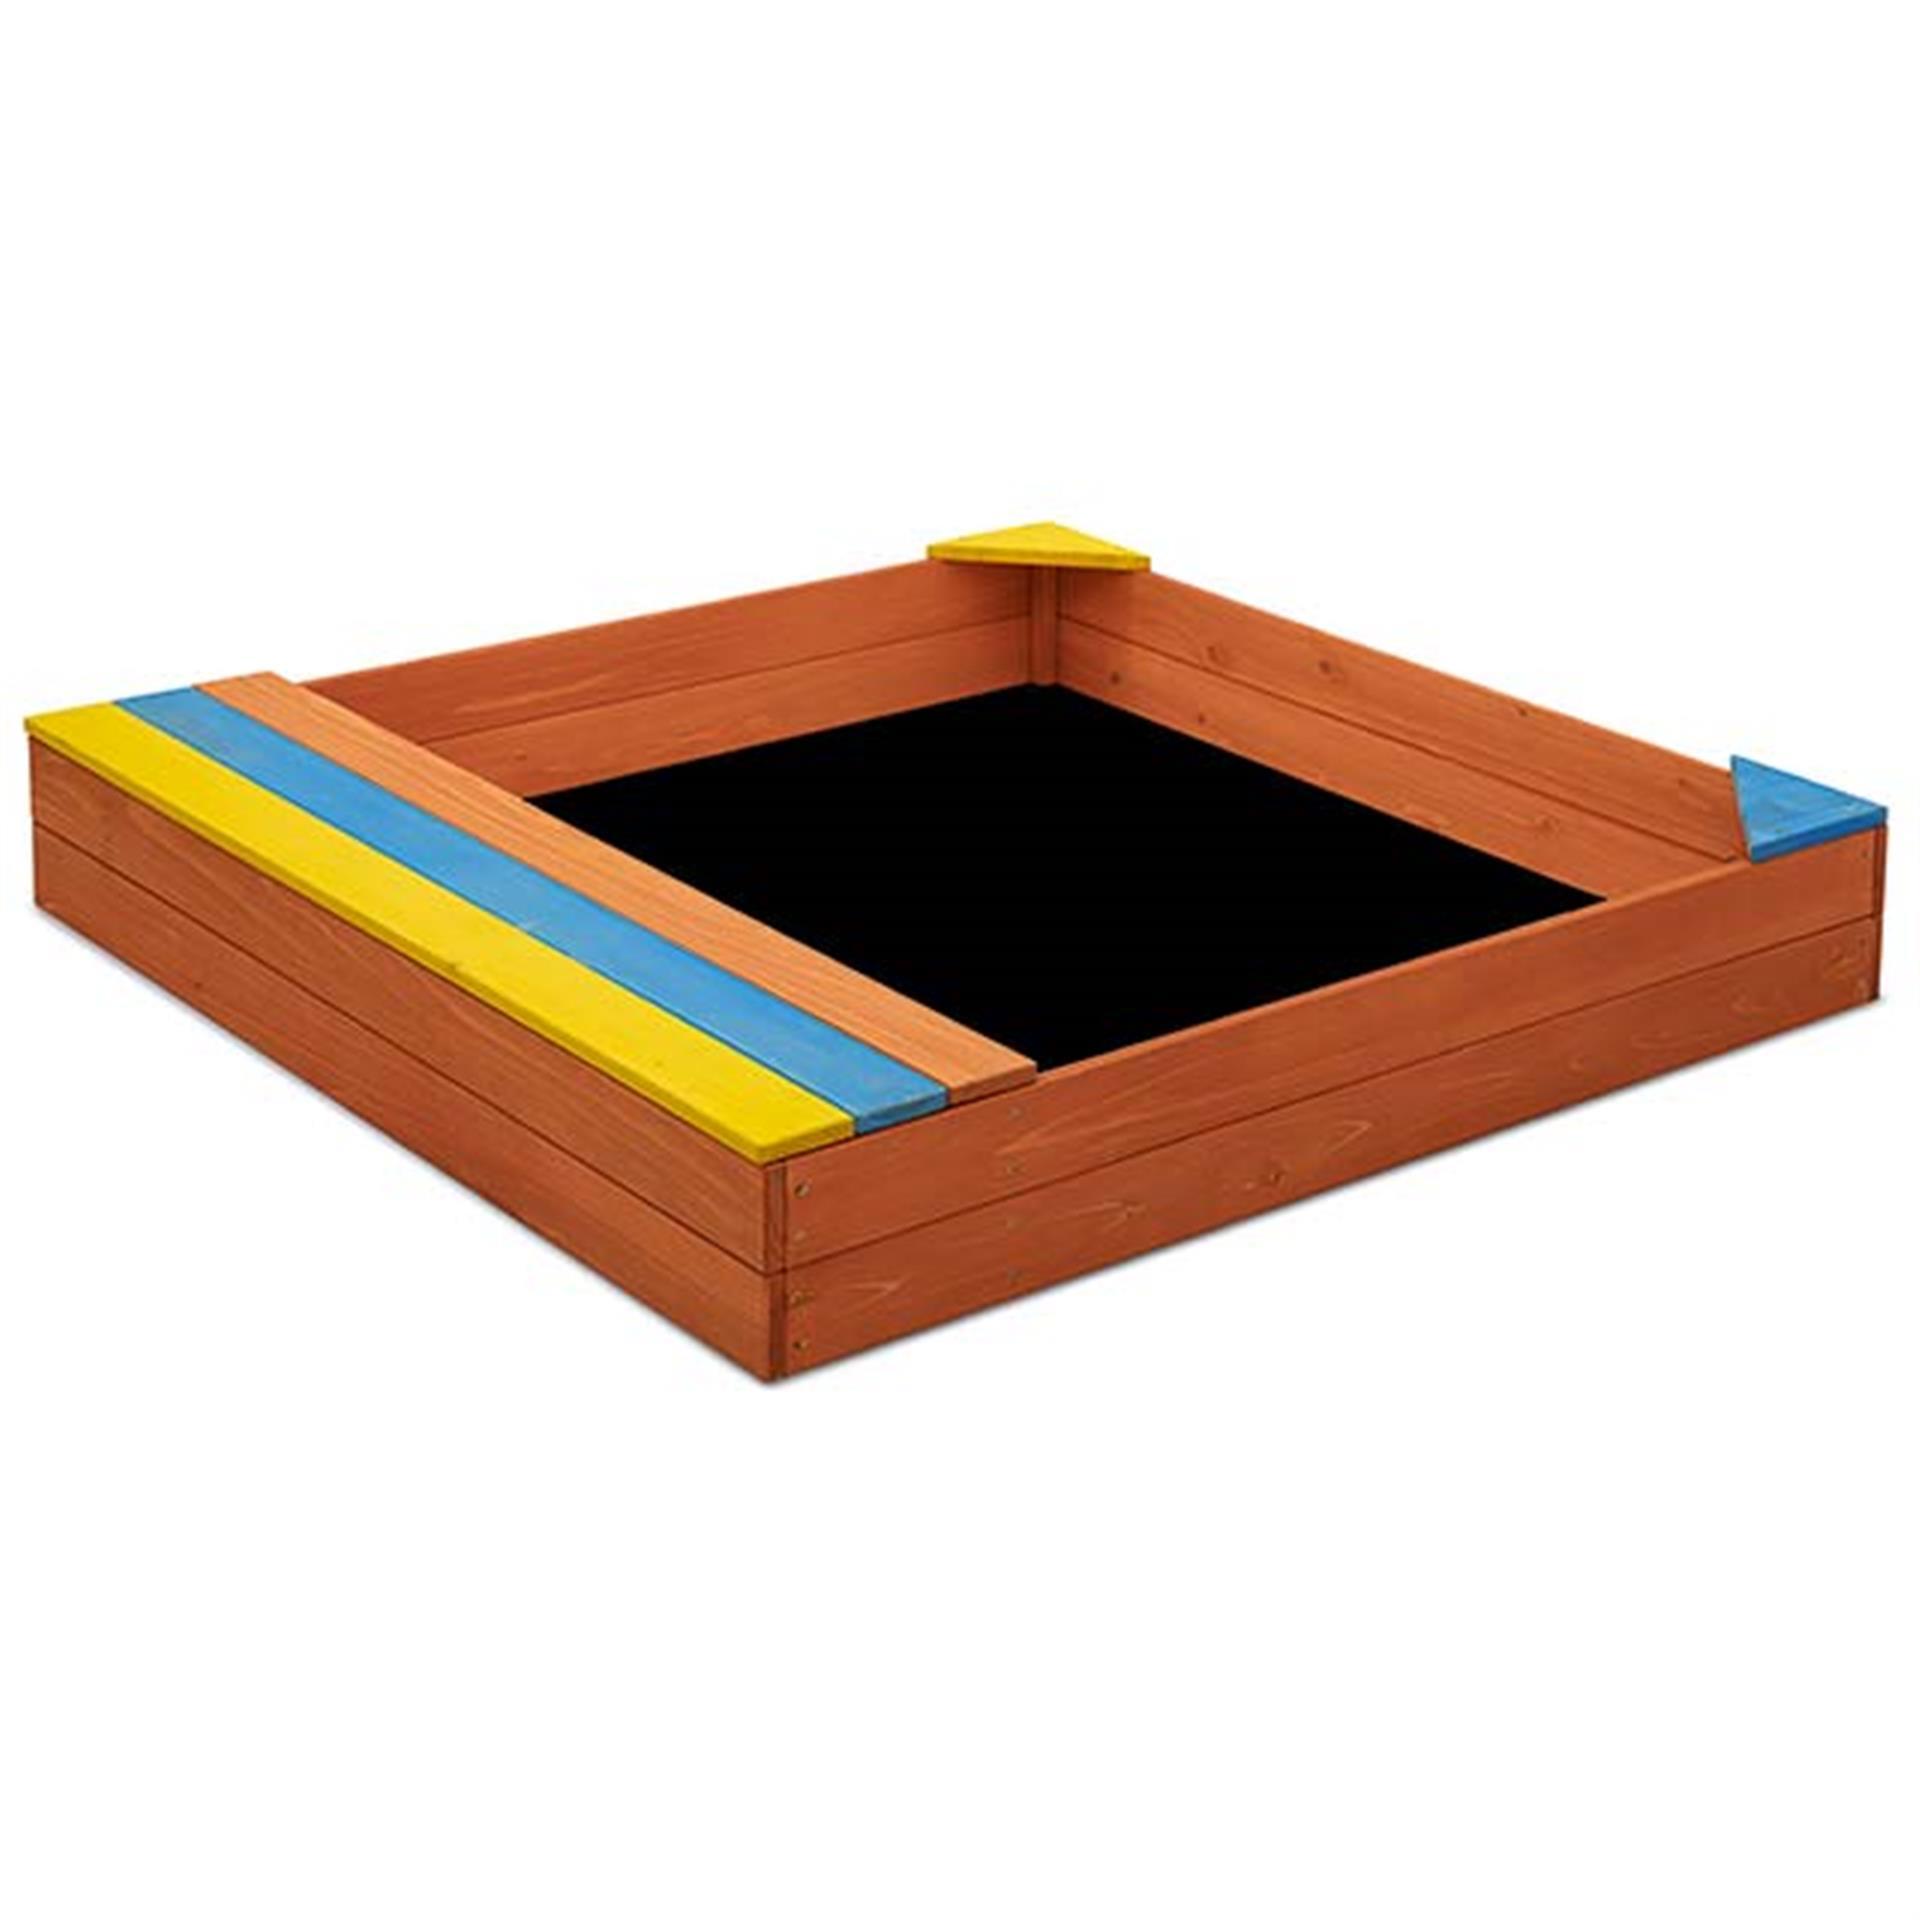 Sandkasten Holz 102x96x15 cm